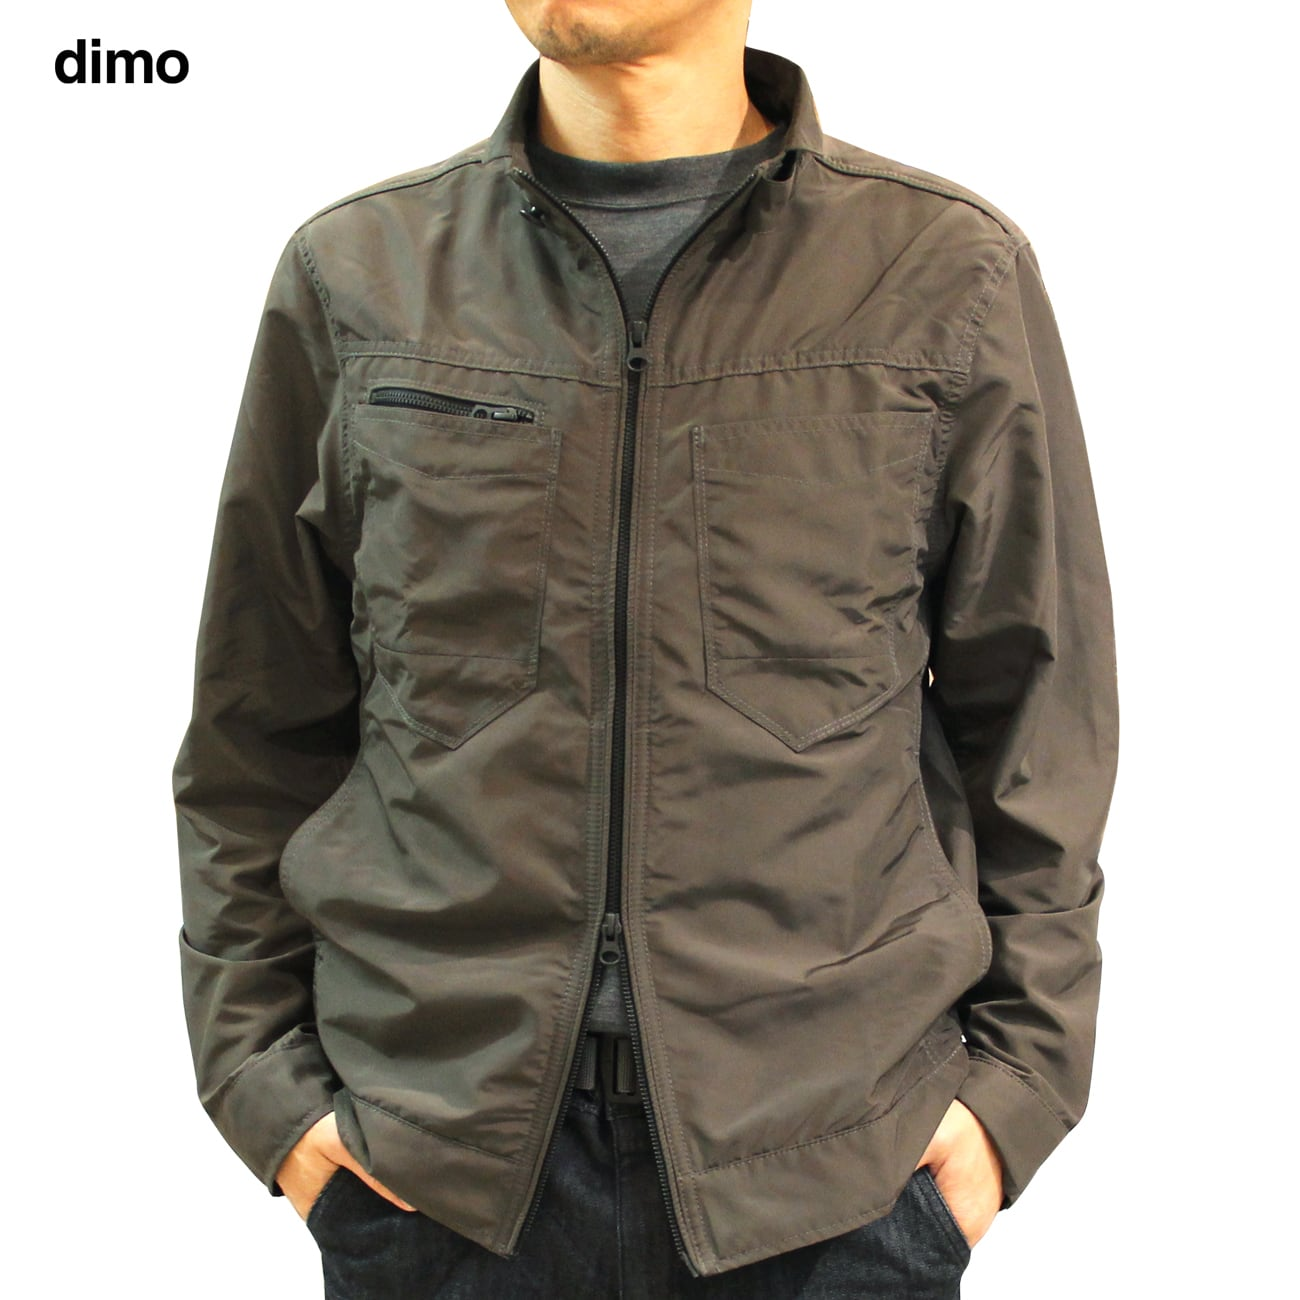 dimo Thermotron jacket D613 4L